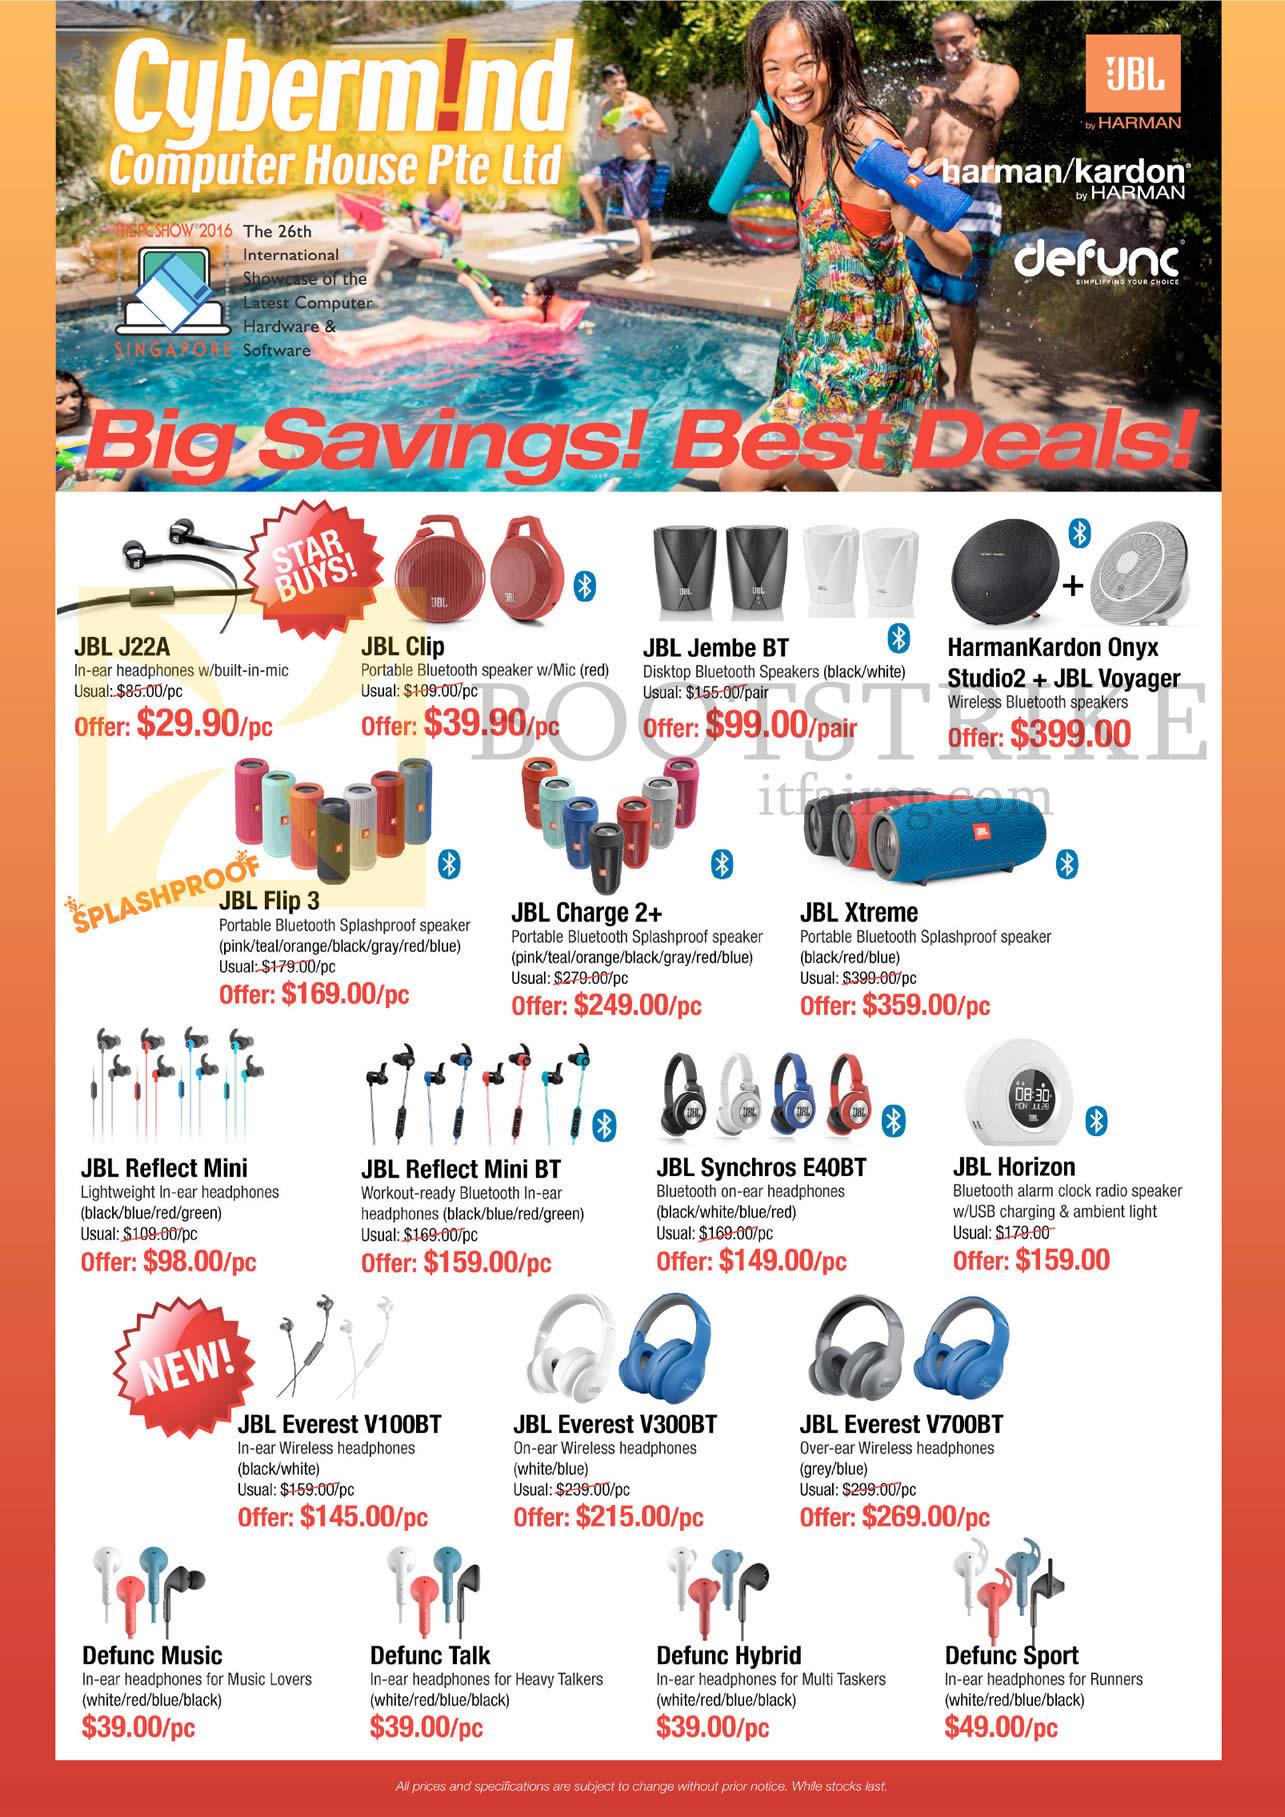 PC SHOW 2016 price list image brochure of Cybermind JBL Earphones, Headphones, Speakers, J22A, Clip, Jembe BT, Flip 3, Charge 2 Plus, Xtreme, Reflect Mini, Mini BT, Synchros E40BT, Horizon, Everest